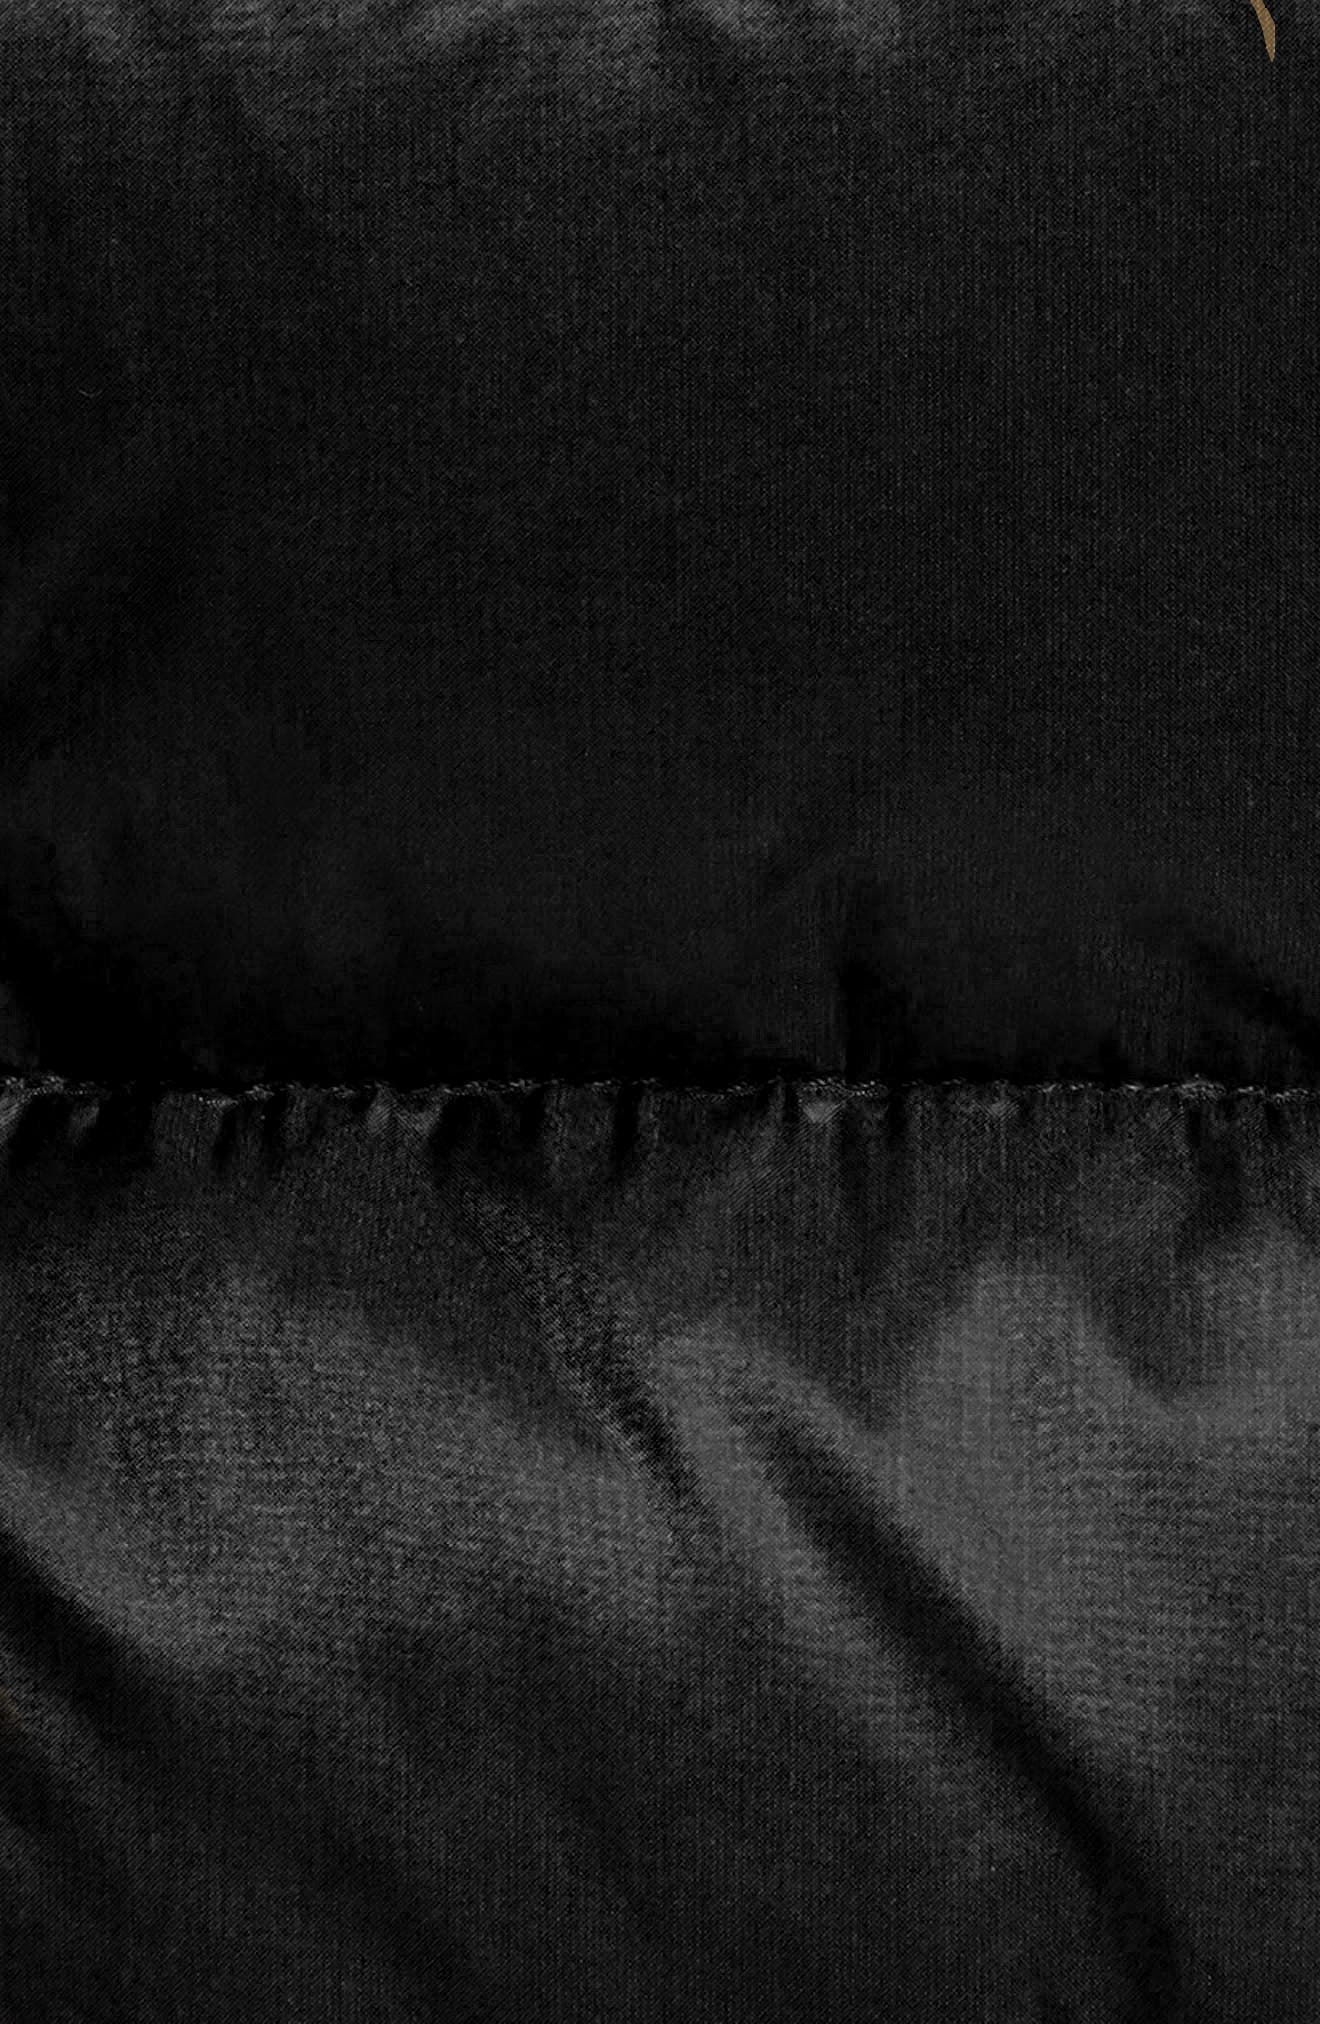 MONCLER, 'Hermine' Grosgrain Trim Water Resistant Down Coat, Alternate thumbnail 7, color, BLACK